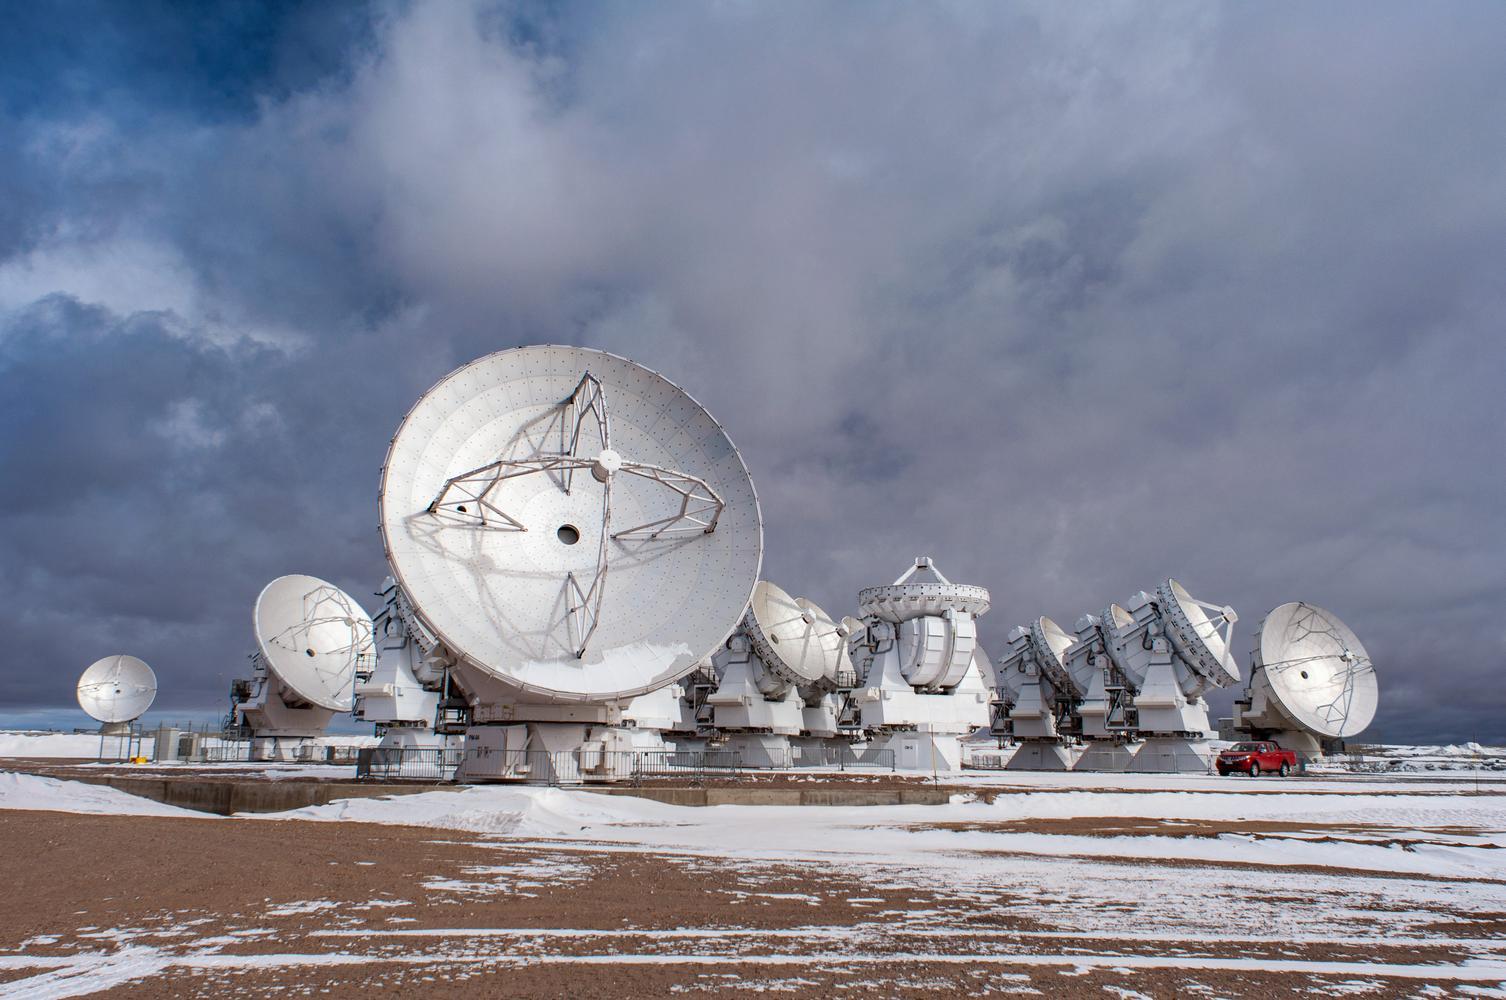 The Atacama Large Millimeter/submillimeter Array, San Pedro de Atacama